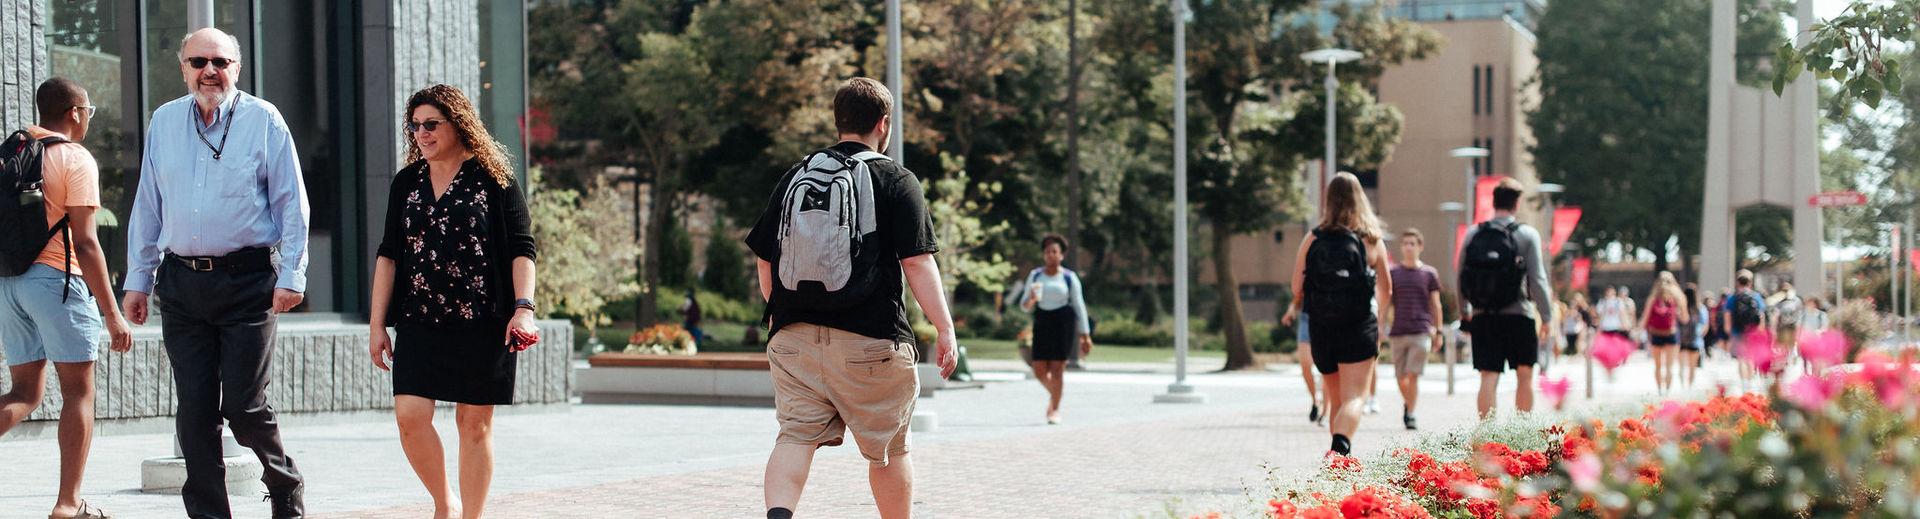 Temple students walk across Polett Walk between classes on Main Campus.